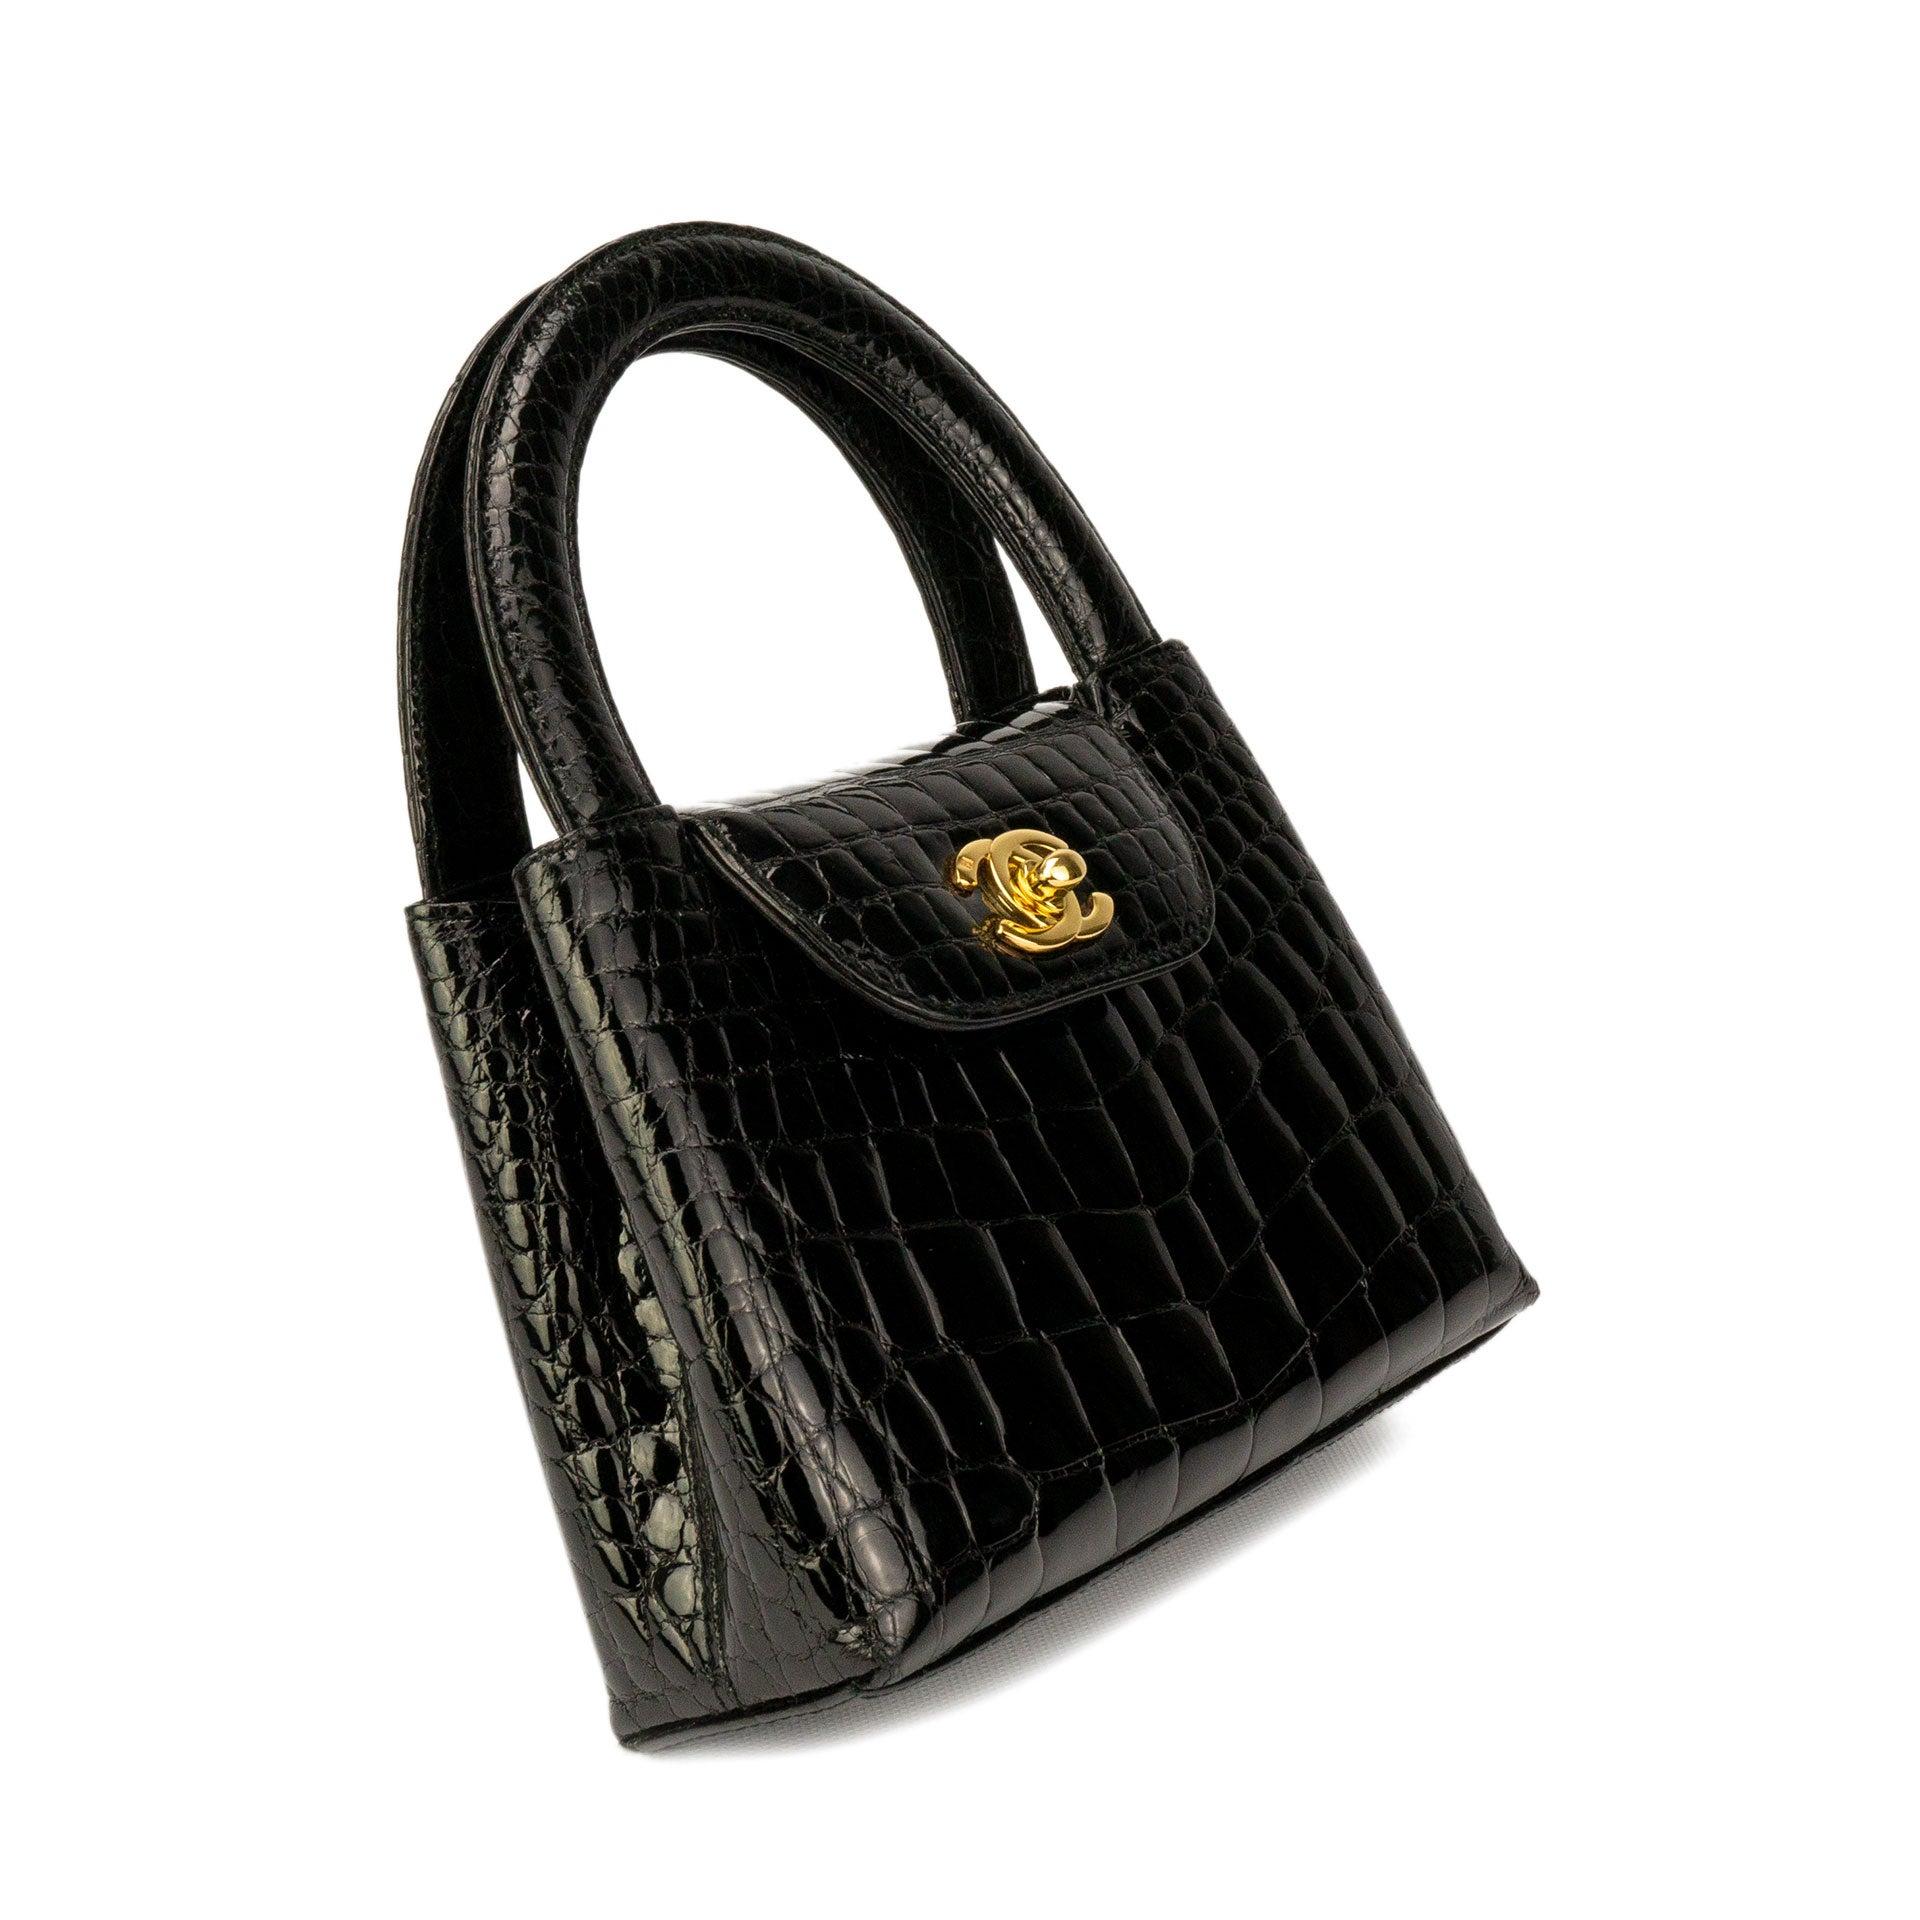 42b0f9830b32 Chanel Black Crocodile Vintage Mini Teeny Tiny Kelly Clutch Alligator Tote  Bag at 1stdibs